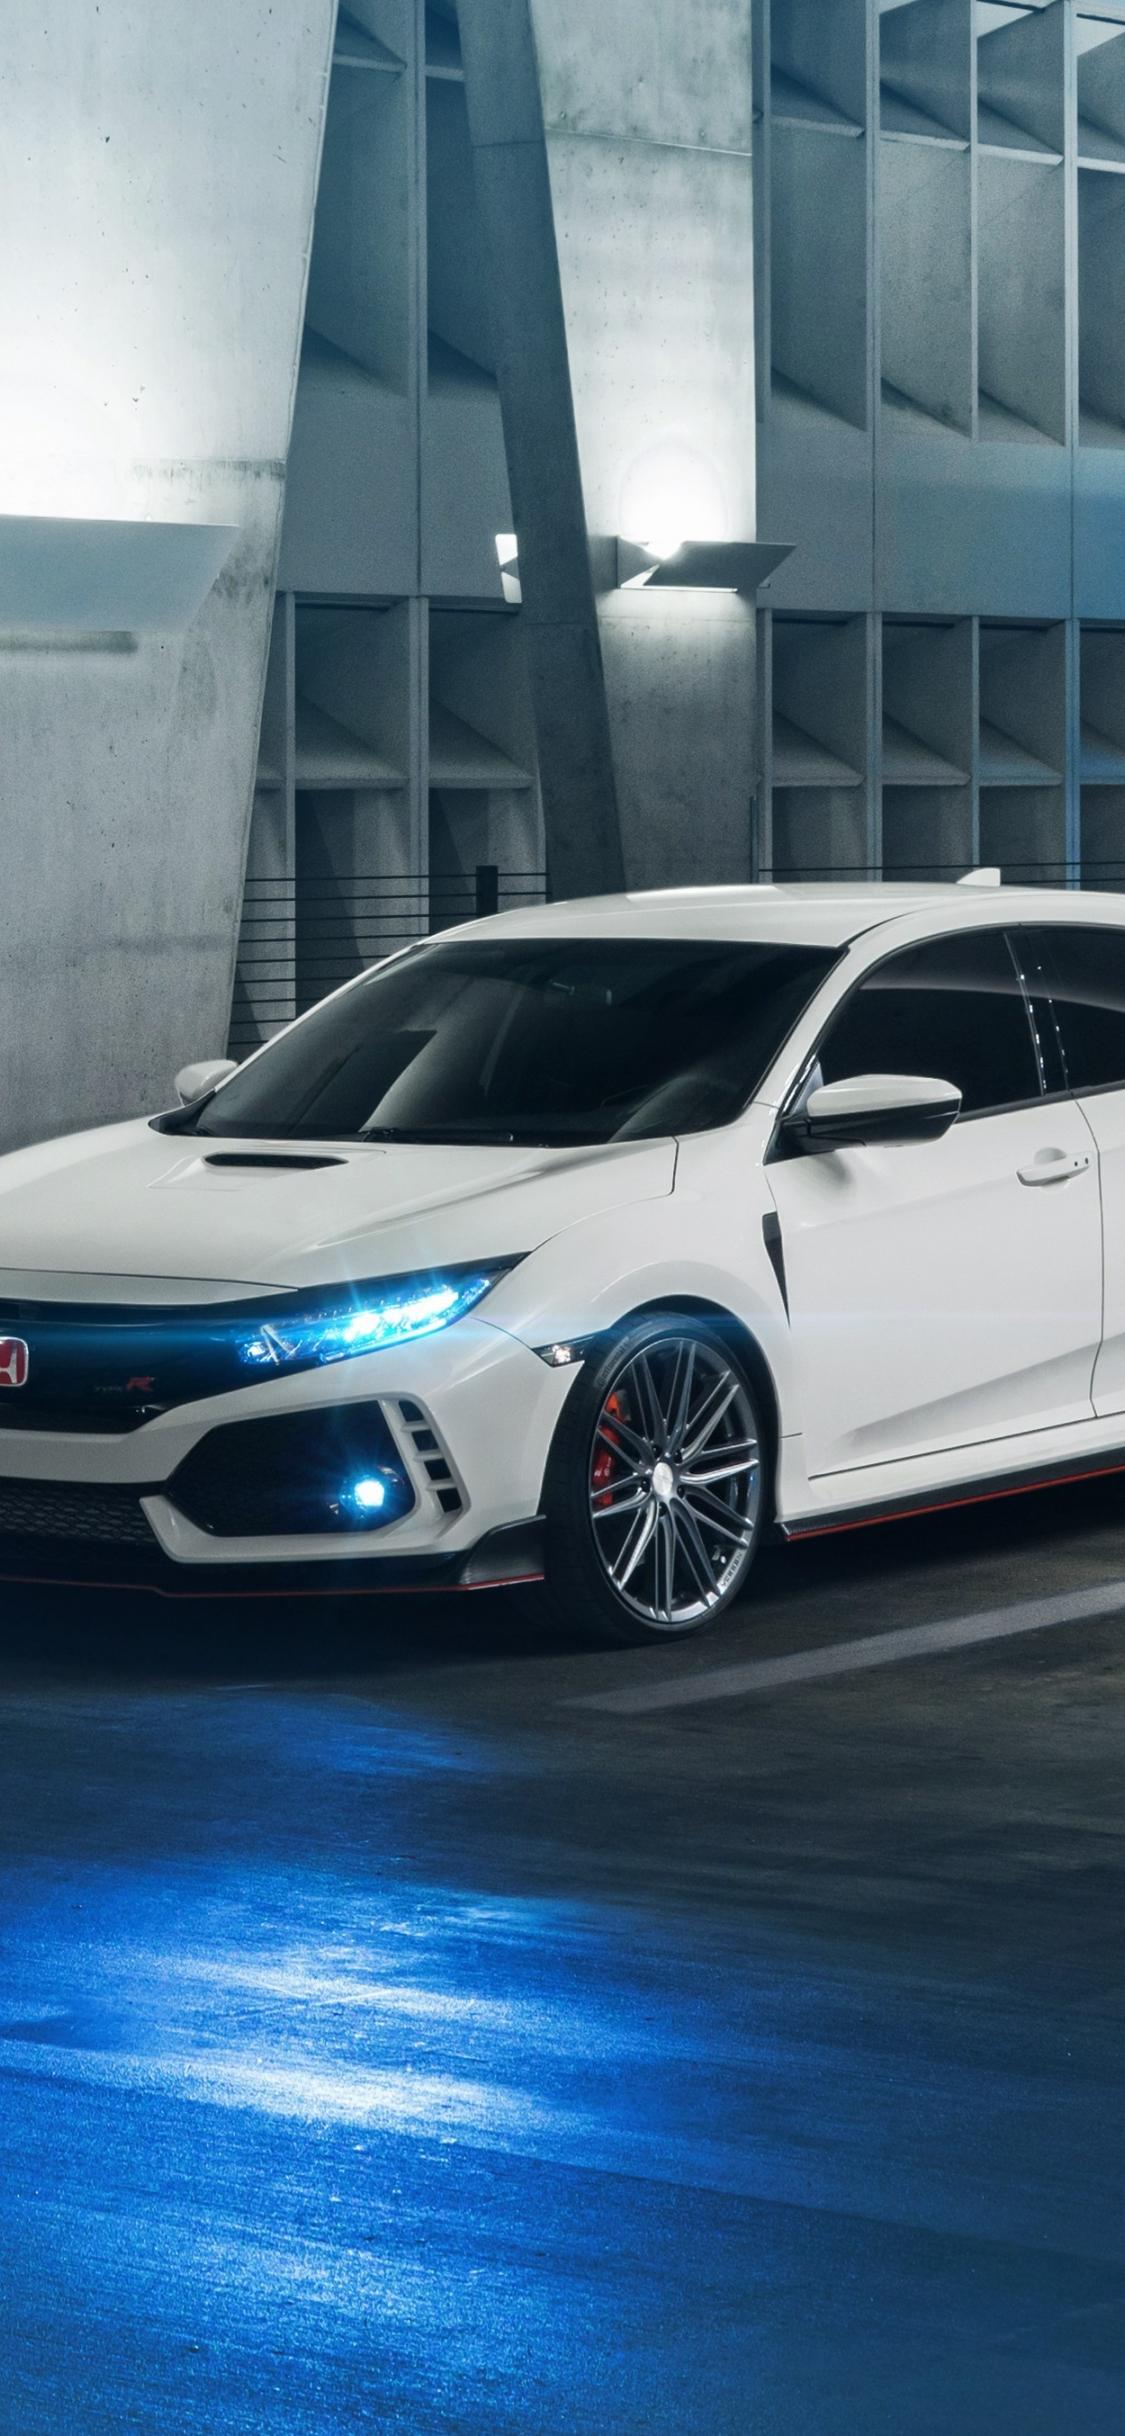 Download 1125x2436 Wallpaper White Honda Civic Type R Car